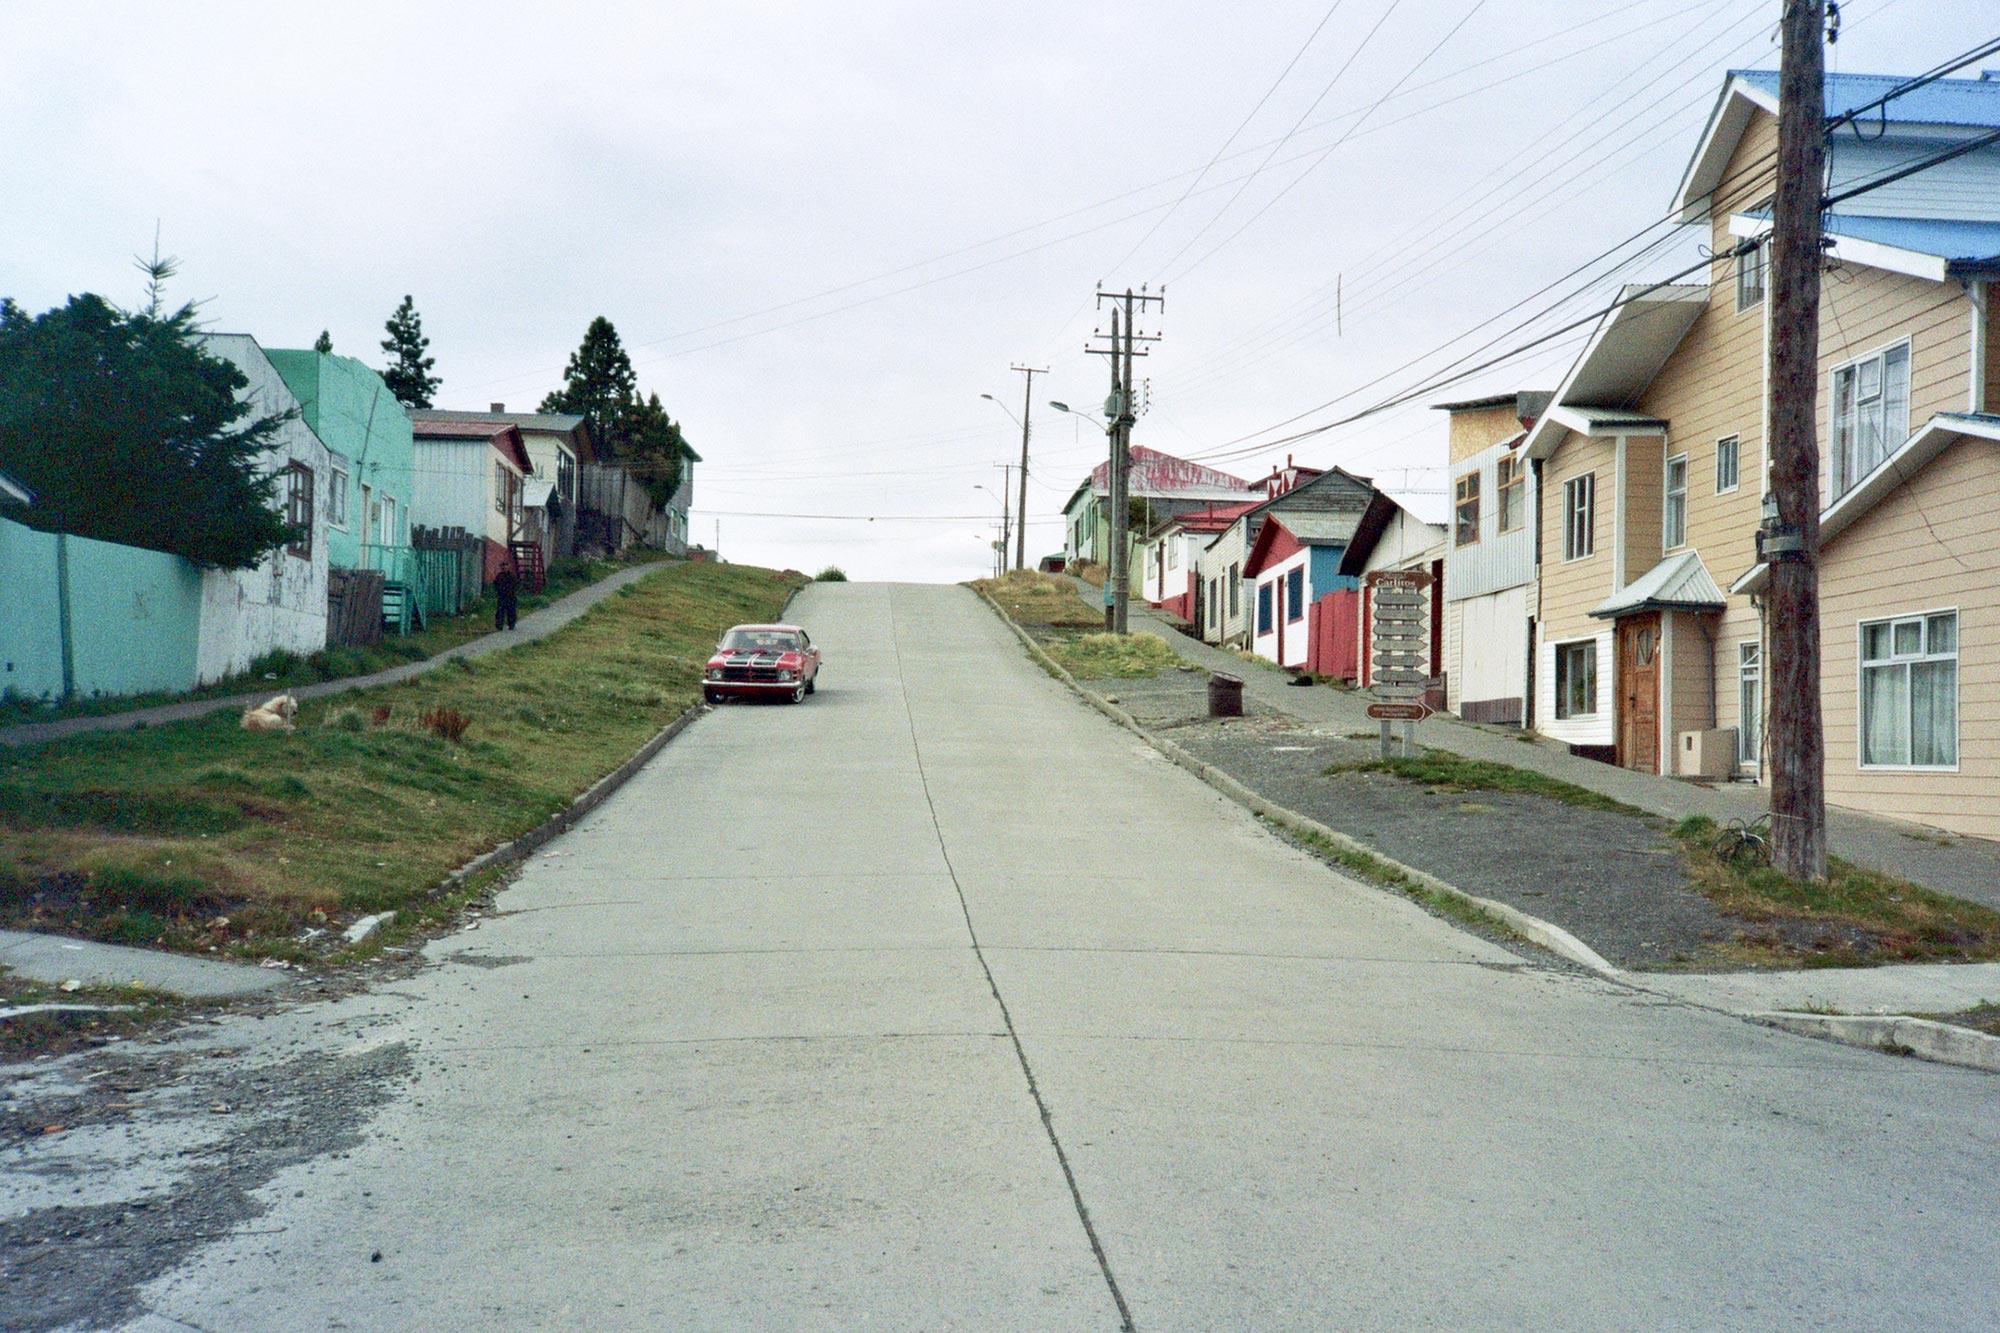 Chile Patagonia Puerto natales street car